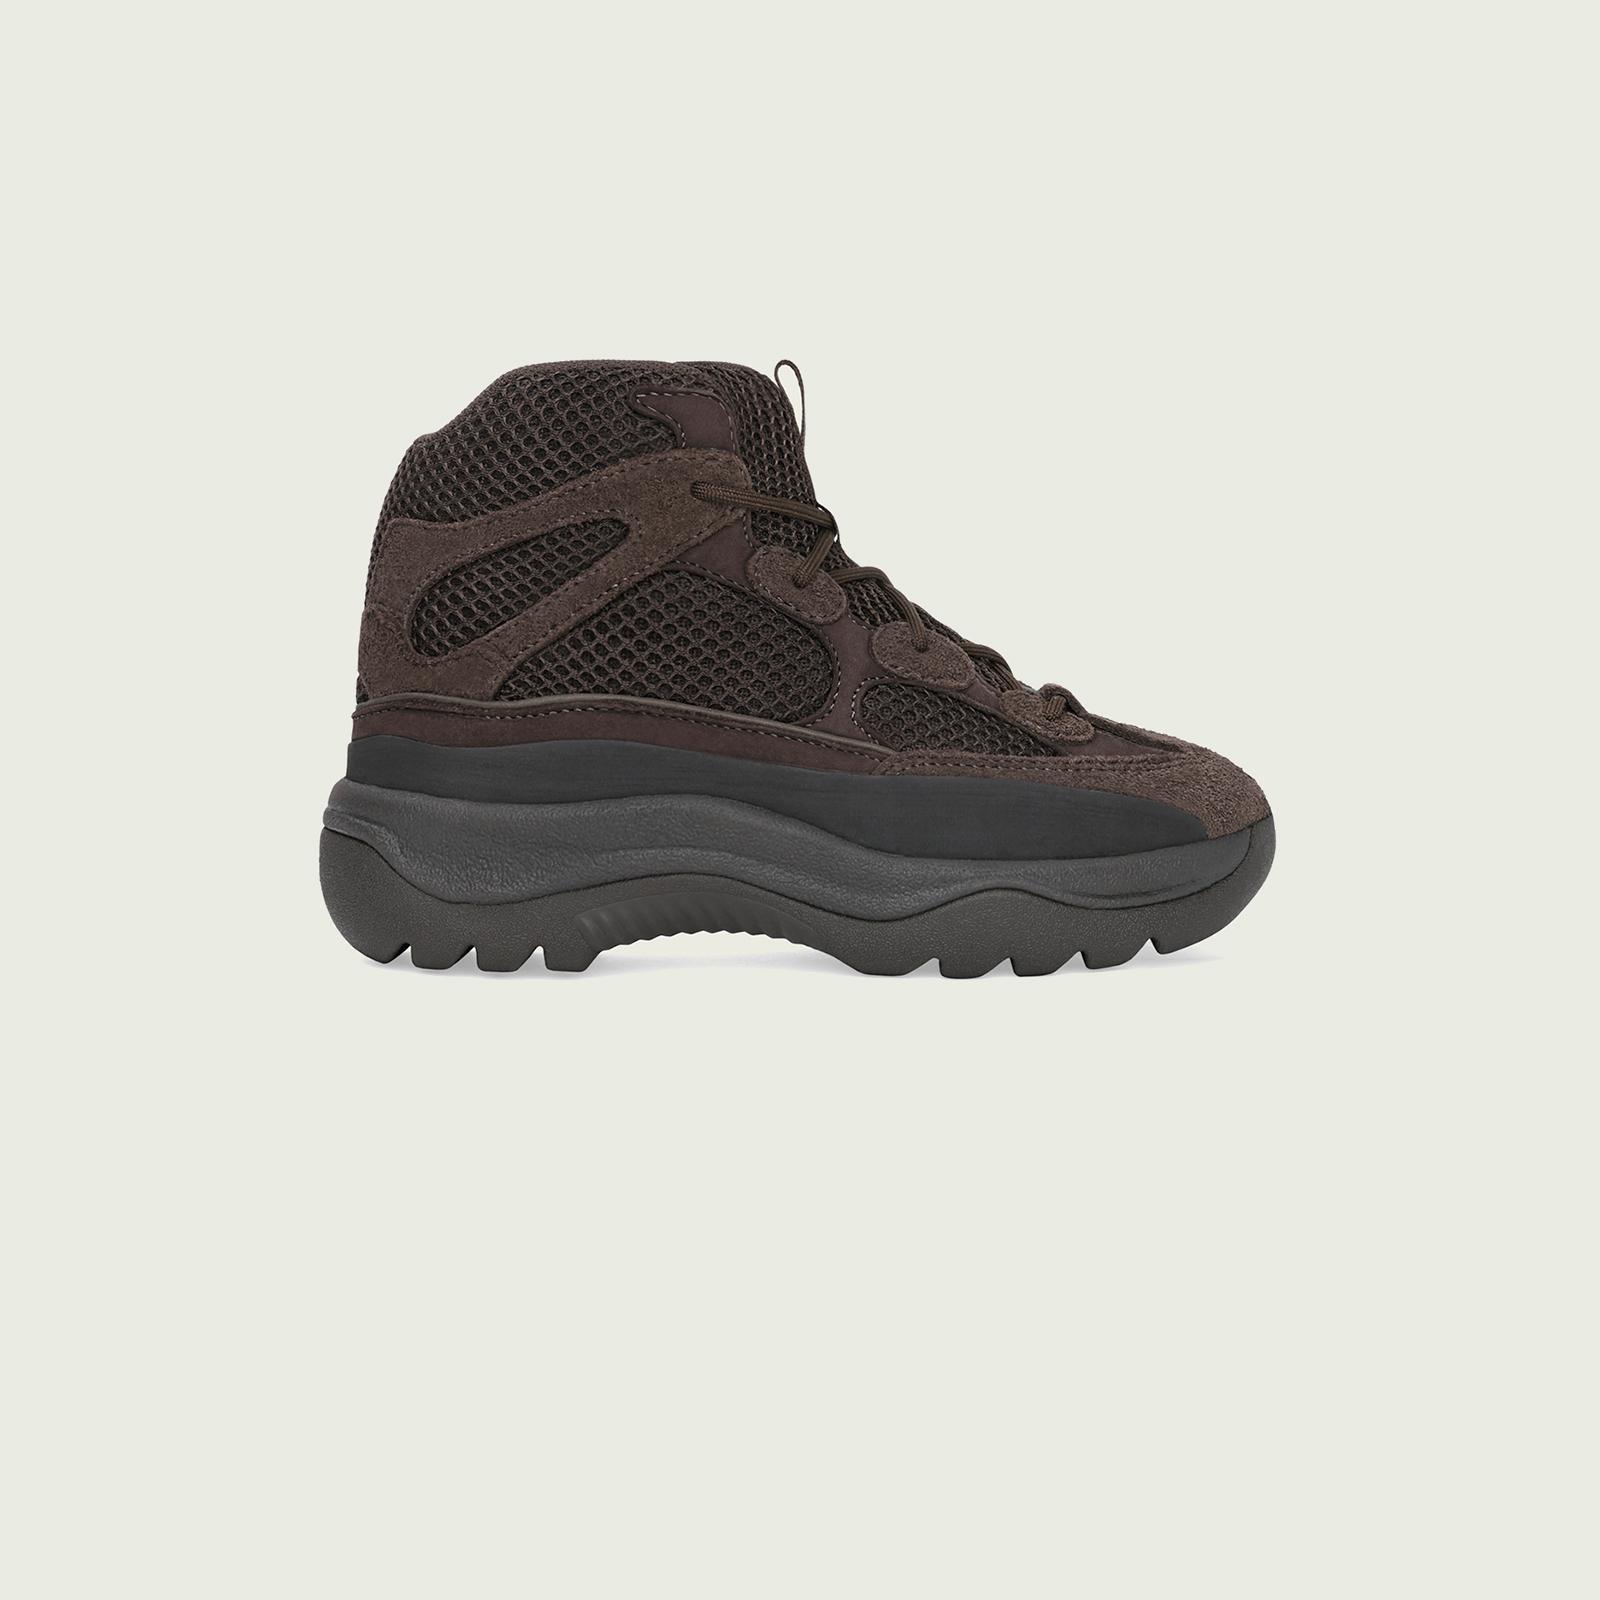 adidas Yeezy Desert Boot Kids Eg6489 Sneakersnstuff I